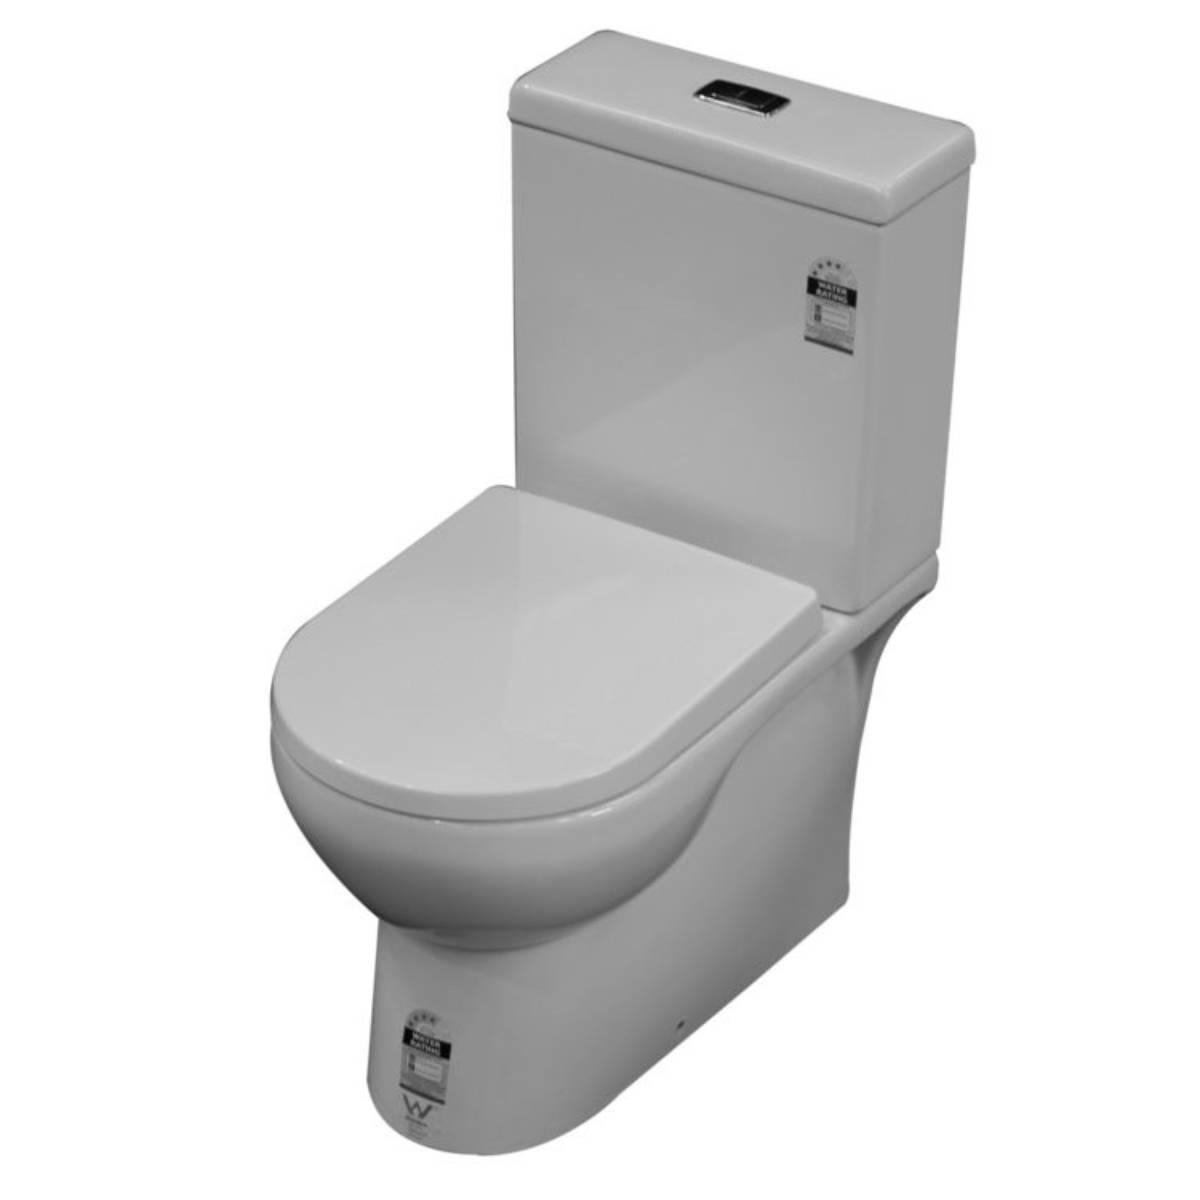 View Photo: Https://www.sinkandbathroomshop.com.au/shop/toilets/back-to-wall-toilet-suites/luna-cleanflush-rimless-toilet/